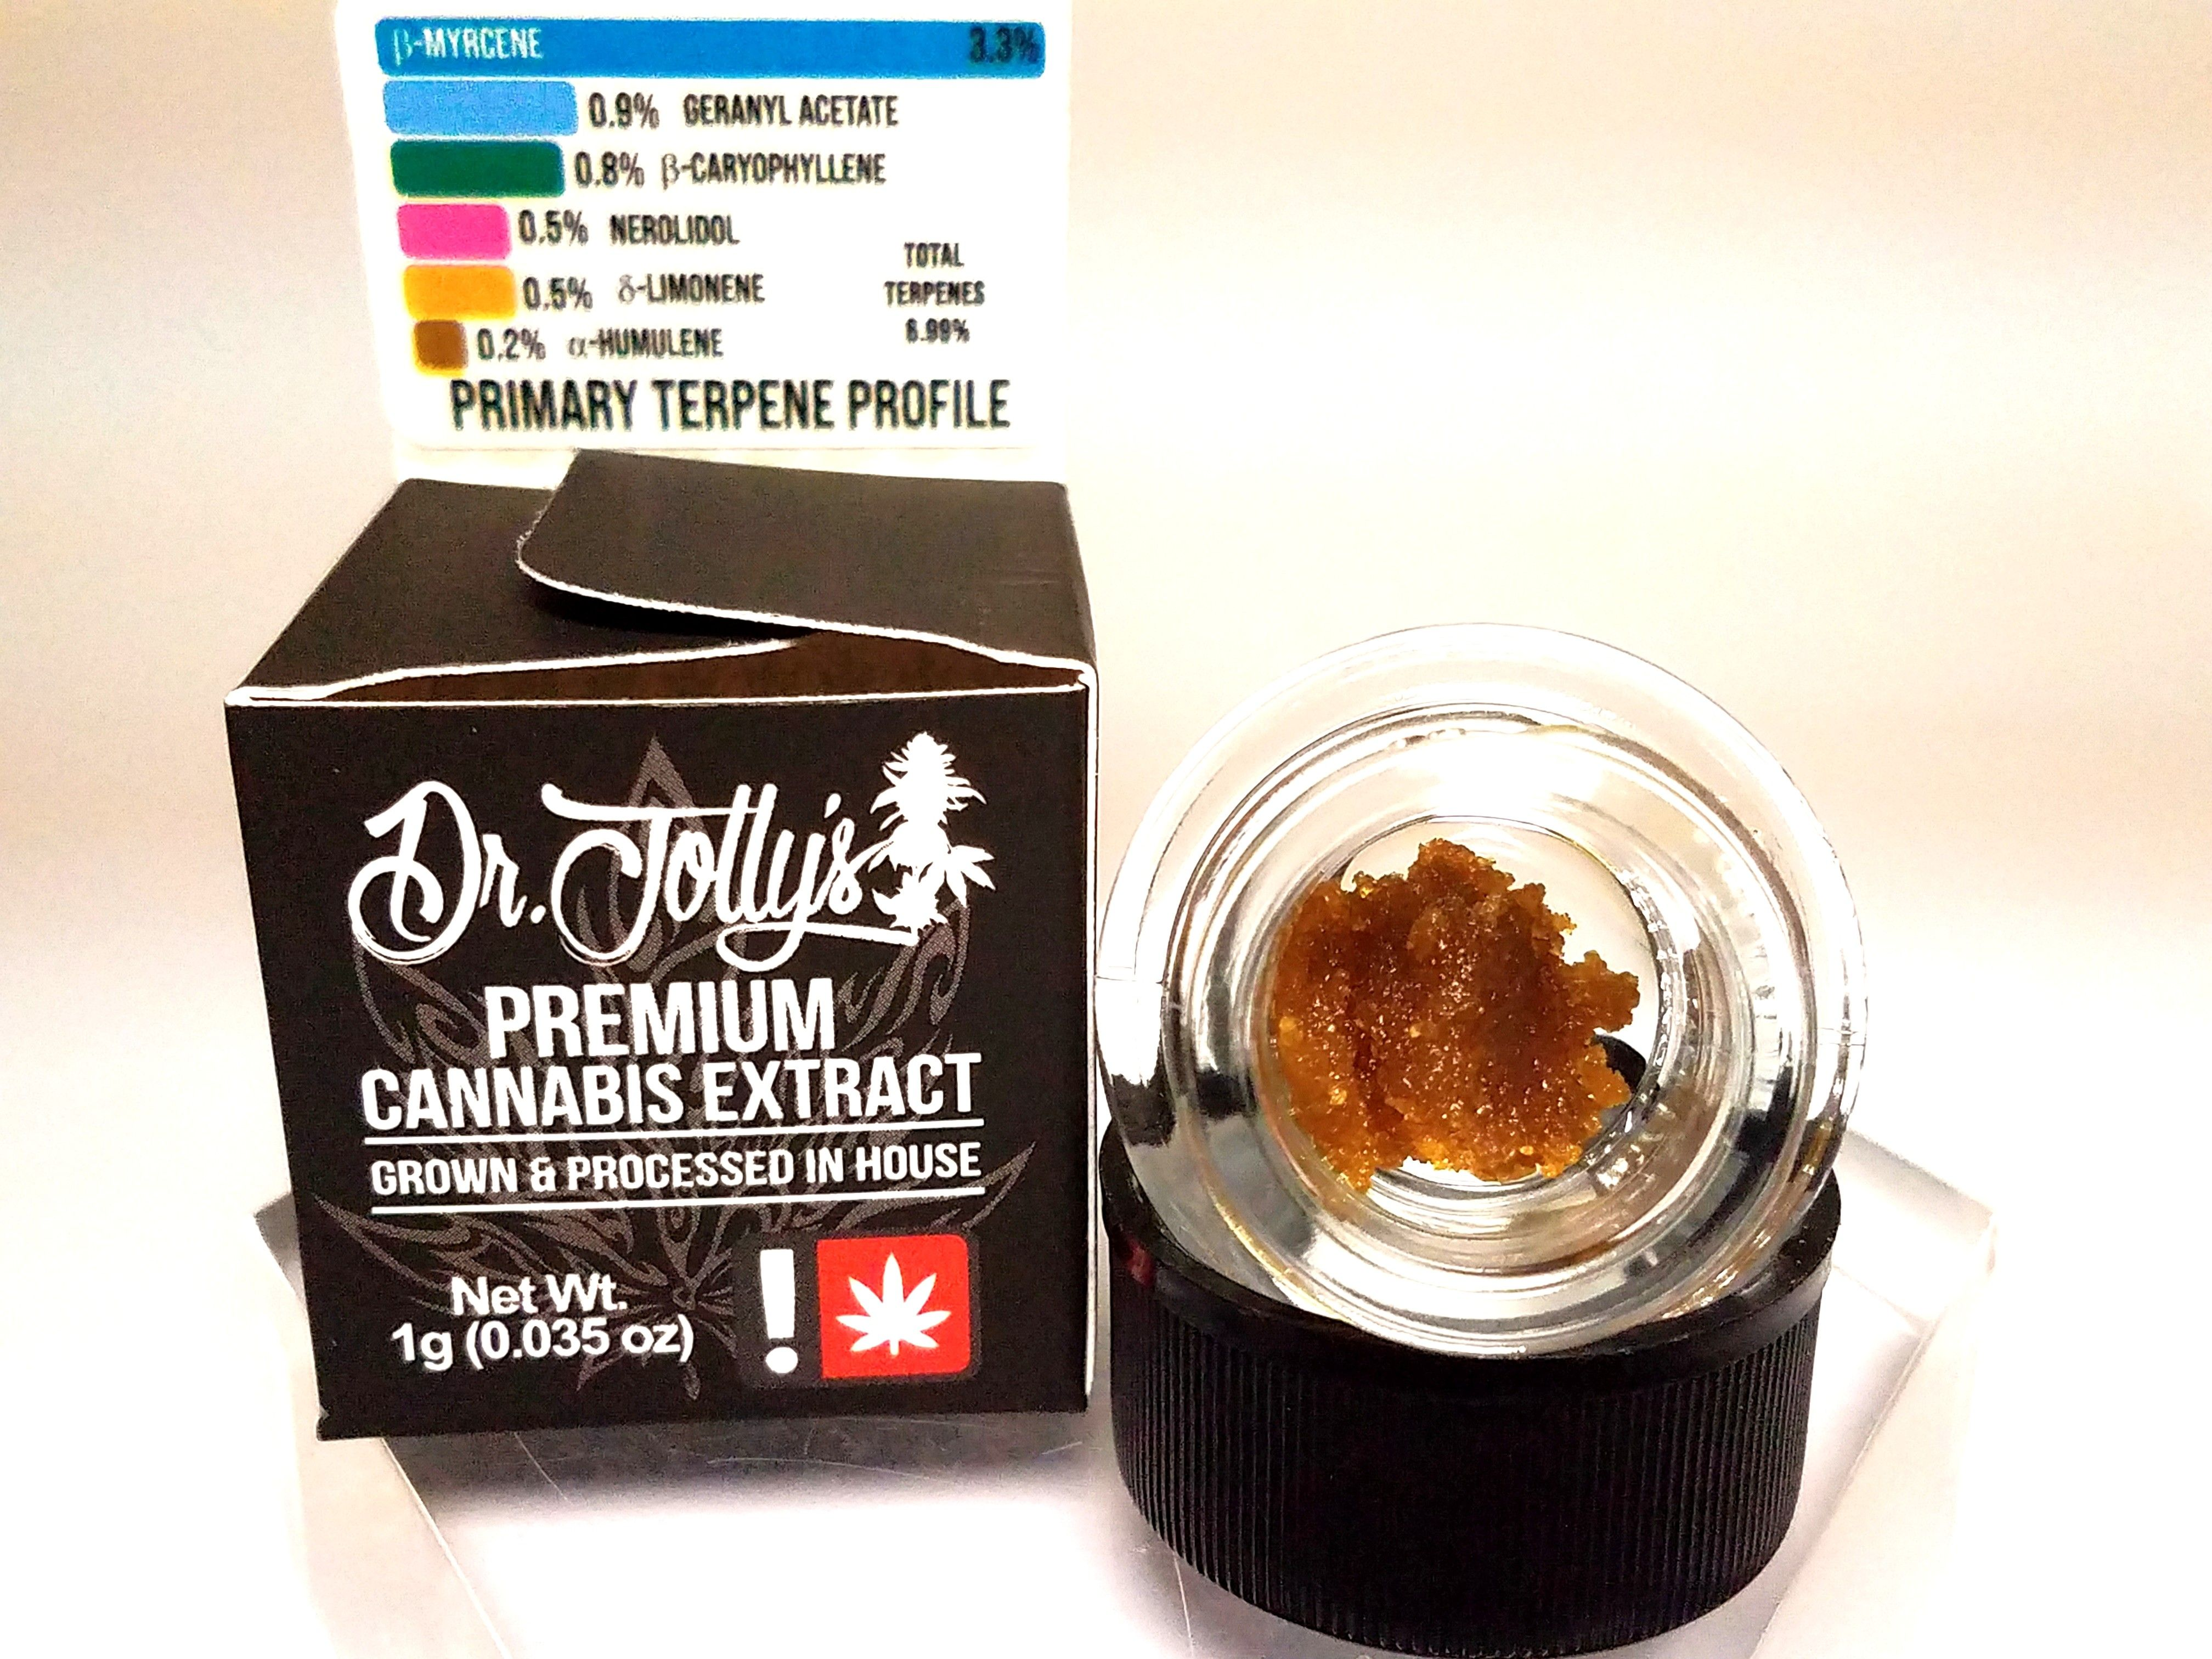 Dr. Jolly's - Cicero Haze, Sativa Hybrid, Sugar Wax